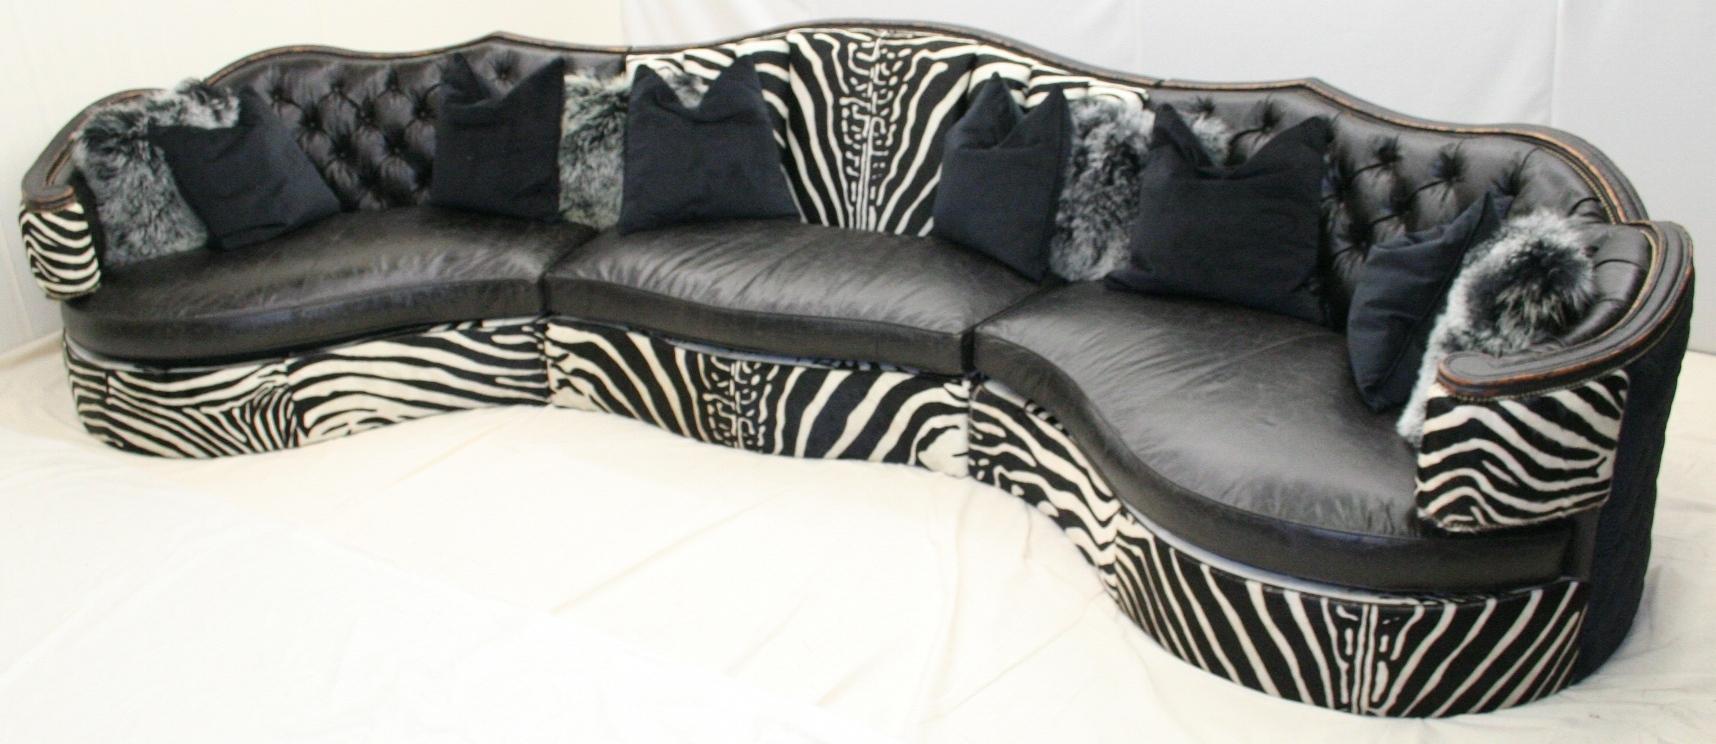 Jungle Room Zebra Sectional